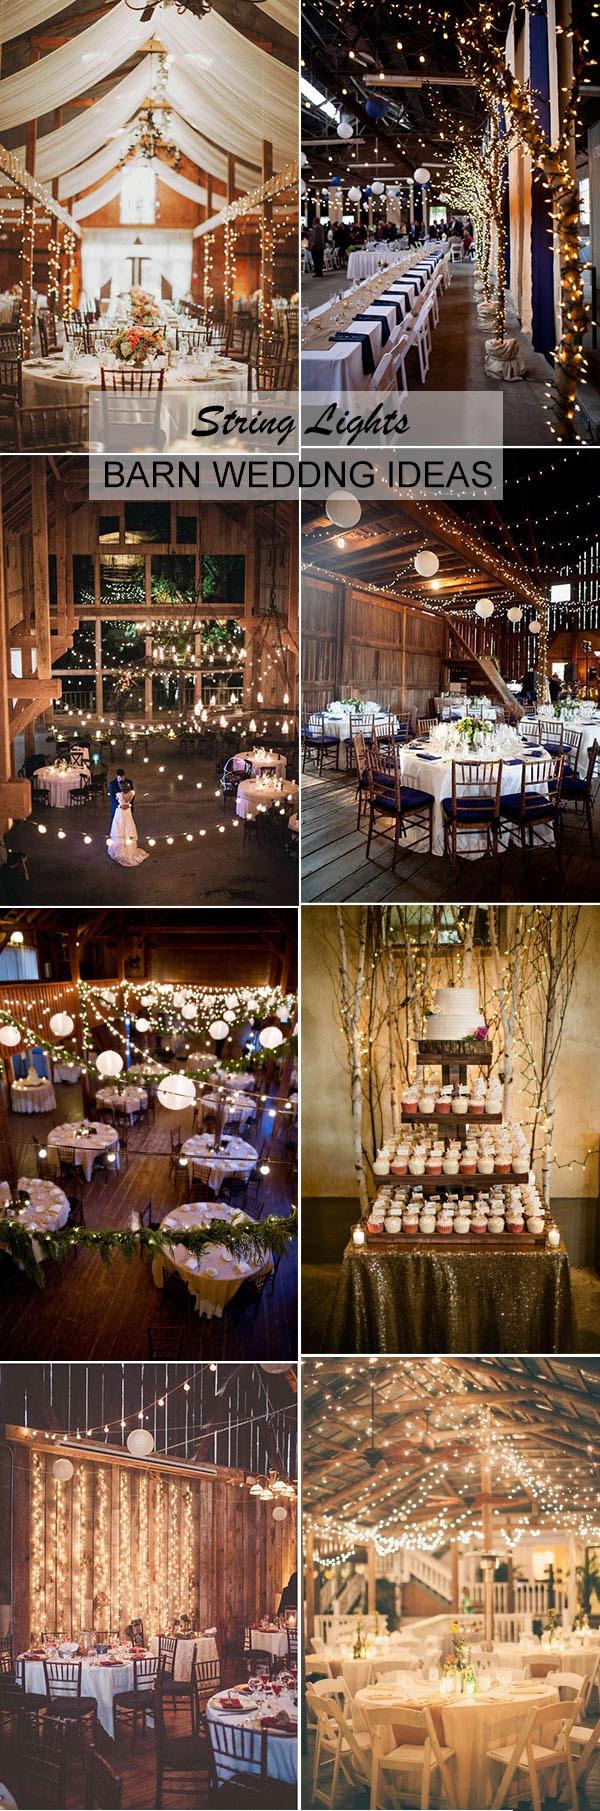 30 Stunning And Creative String Lights Wedding Decor Ideas Stylish Wedd Blog